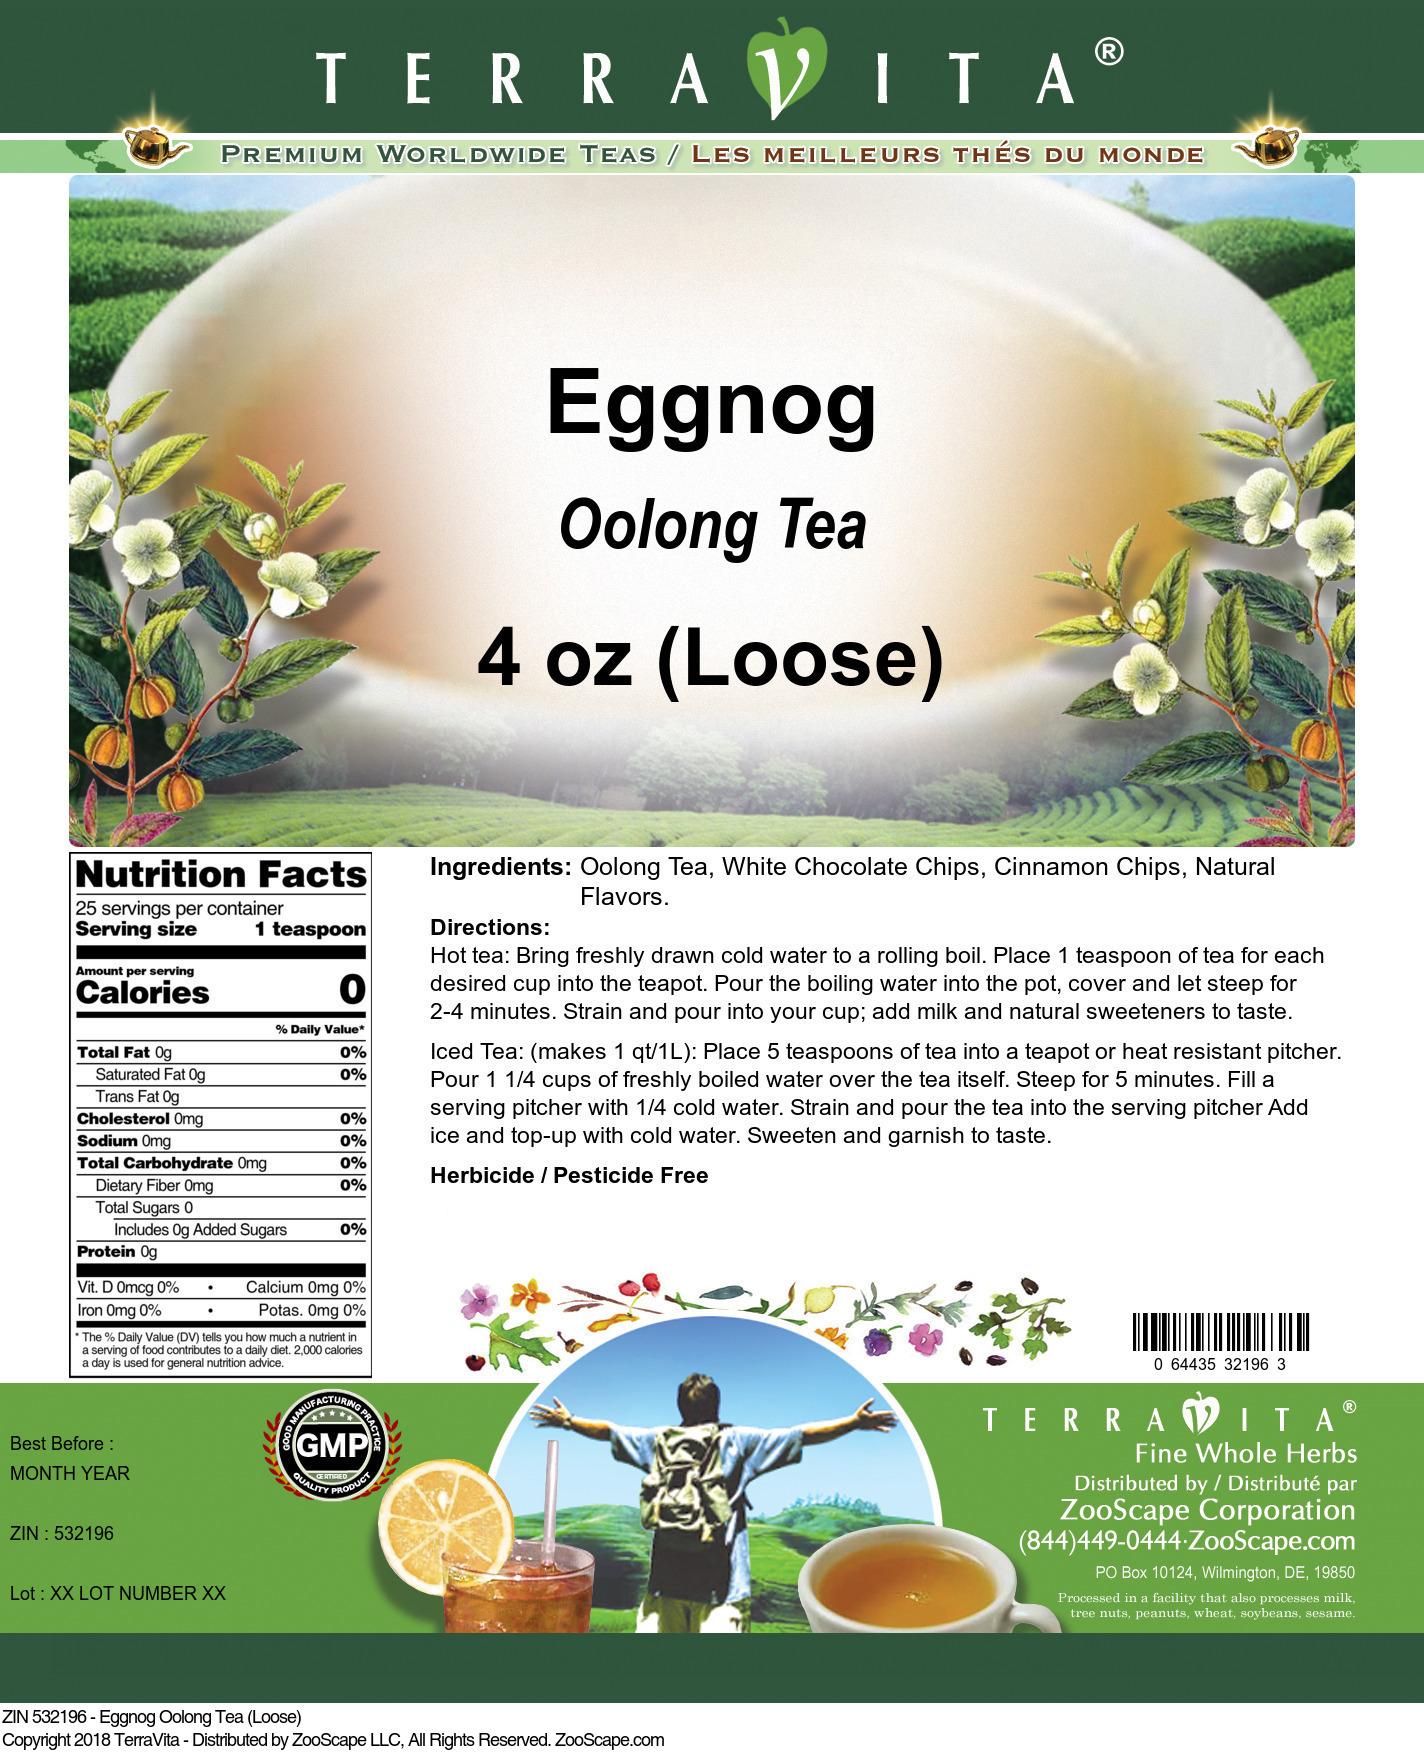 Eggnog Oolong Tea (Loose)